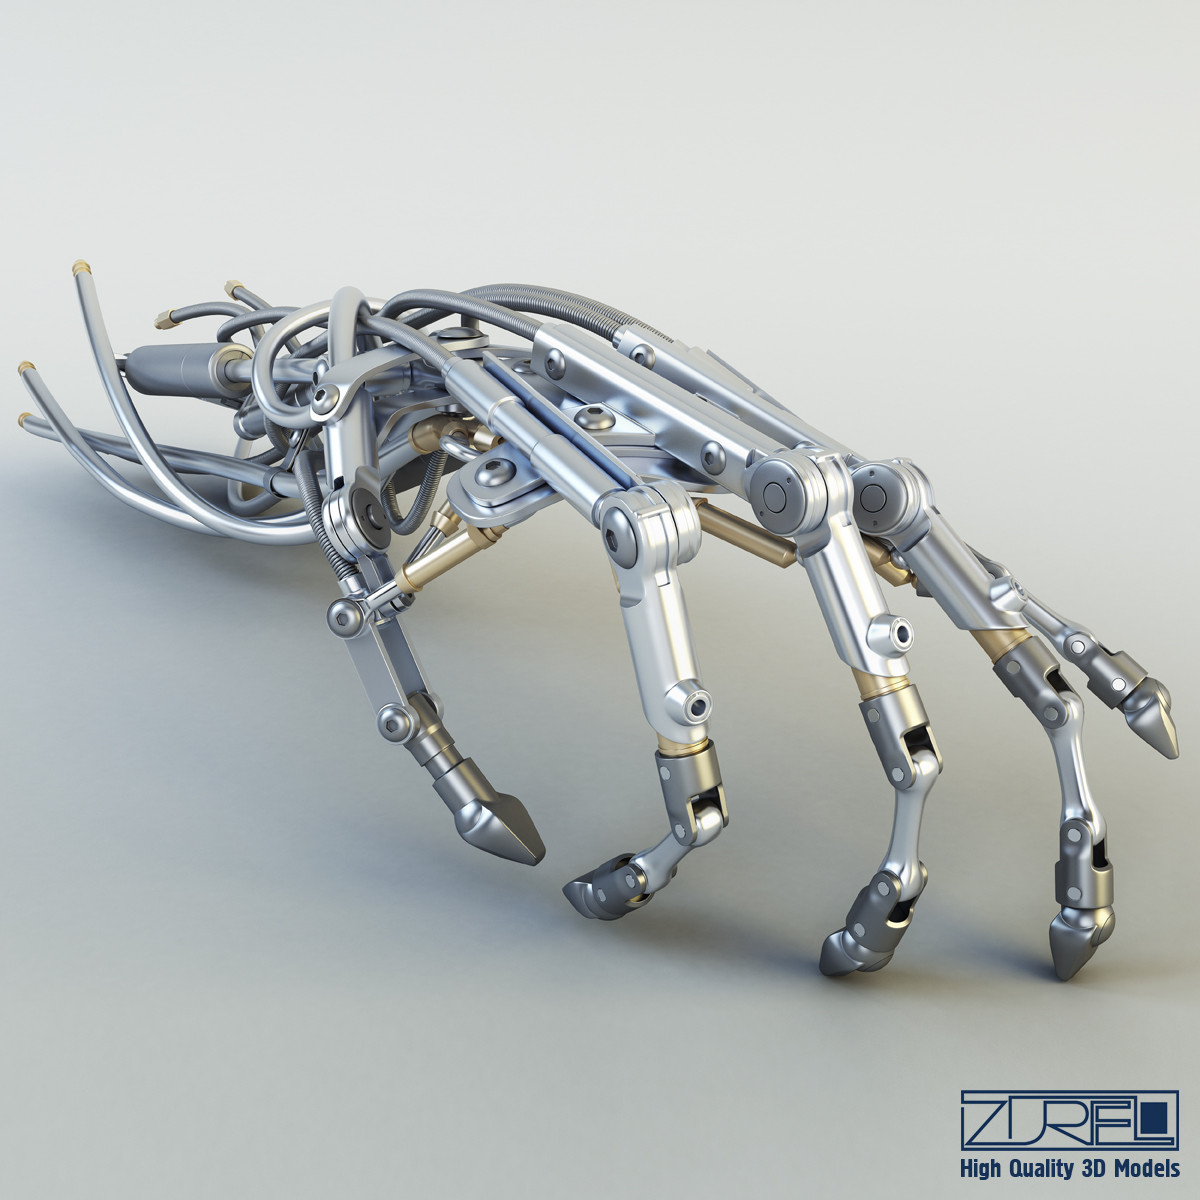 Robotic_hand_0001.jpg